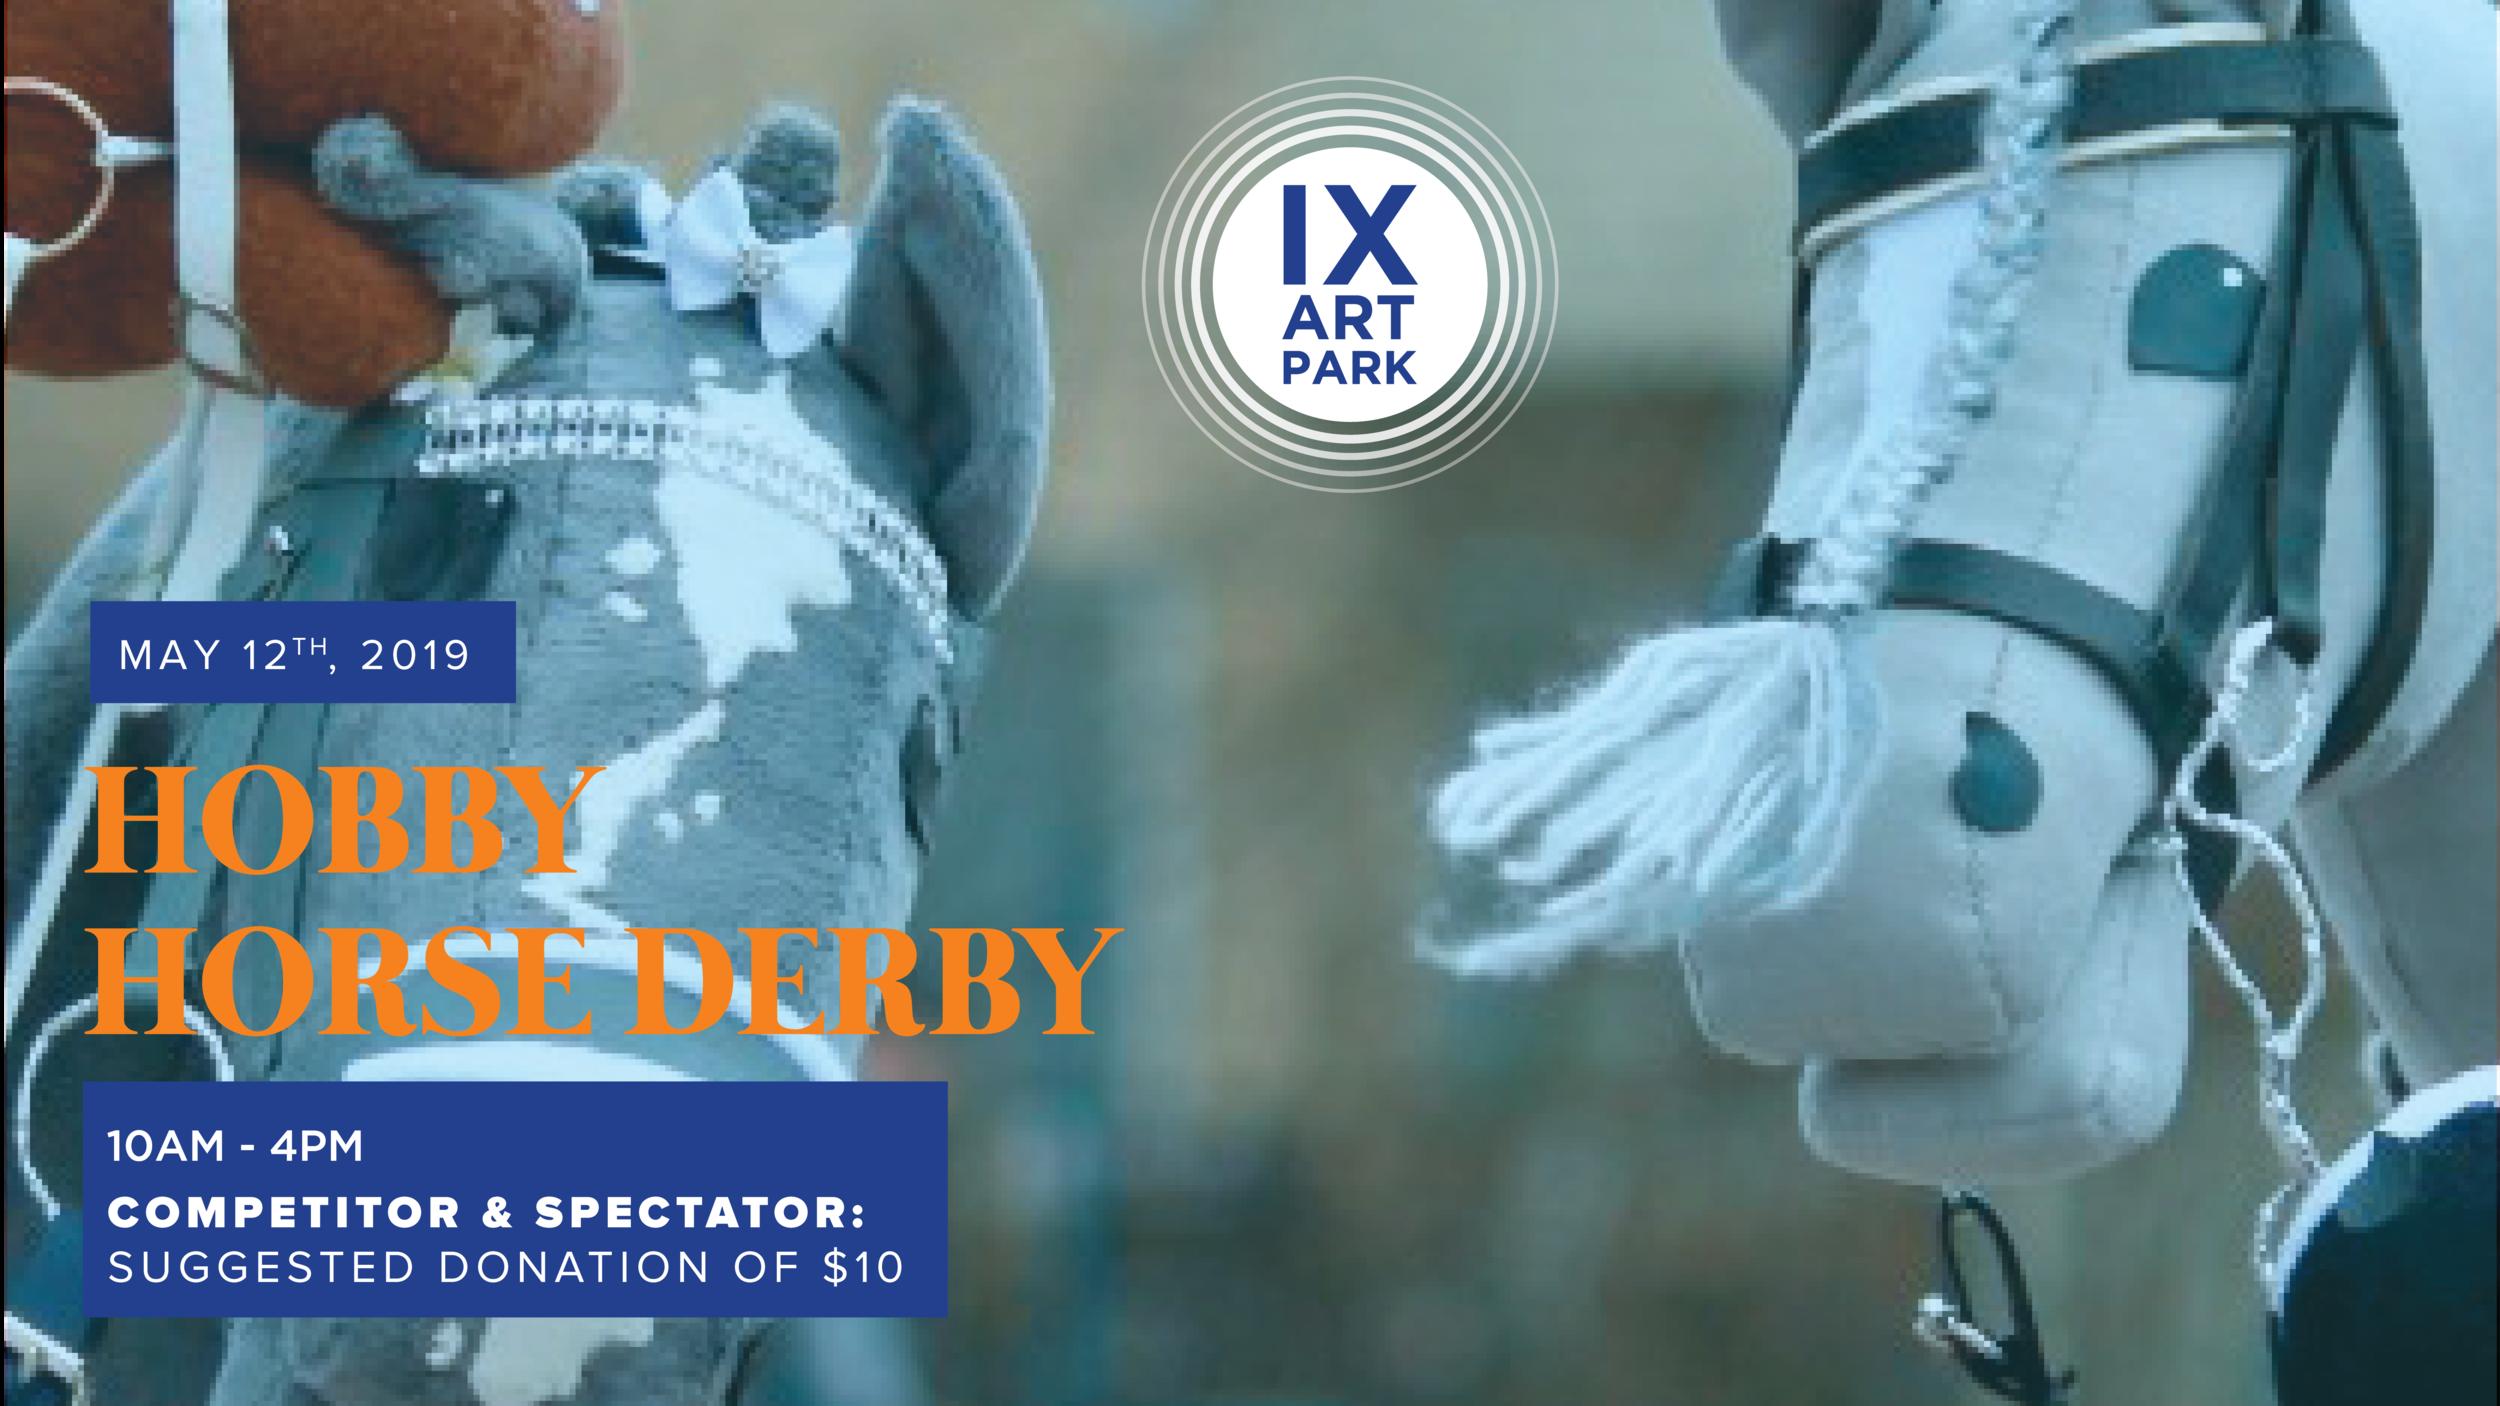 HobbyHorseDerby_IX2019_Facebook Event Header (2).png